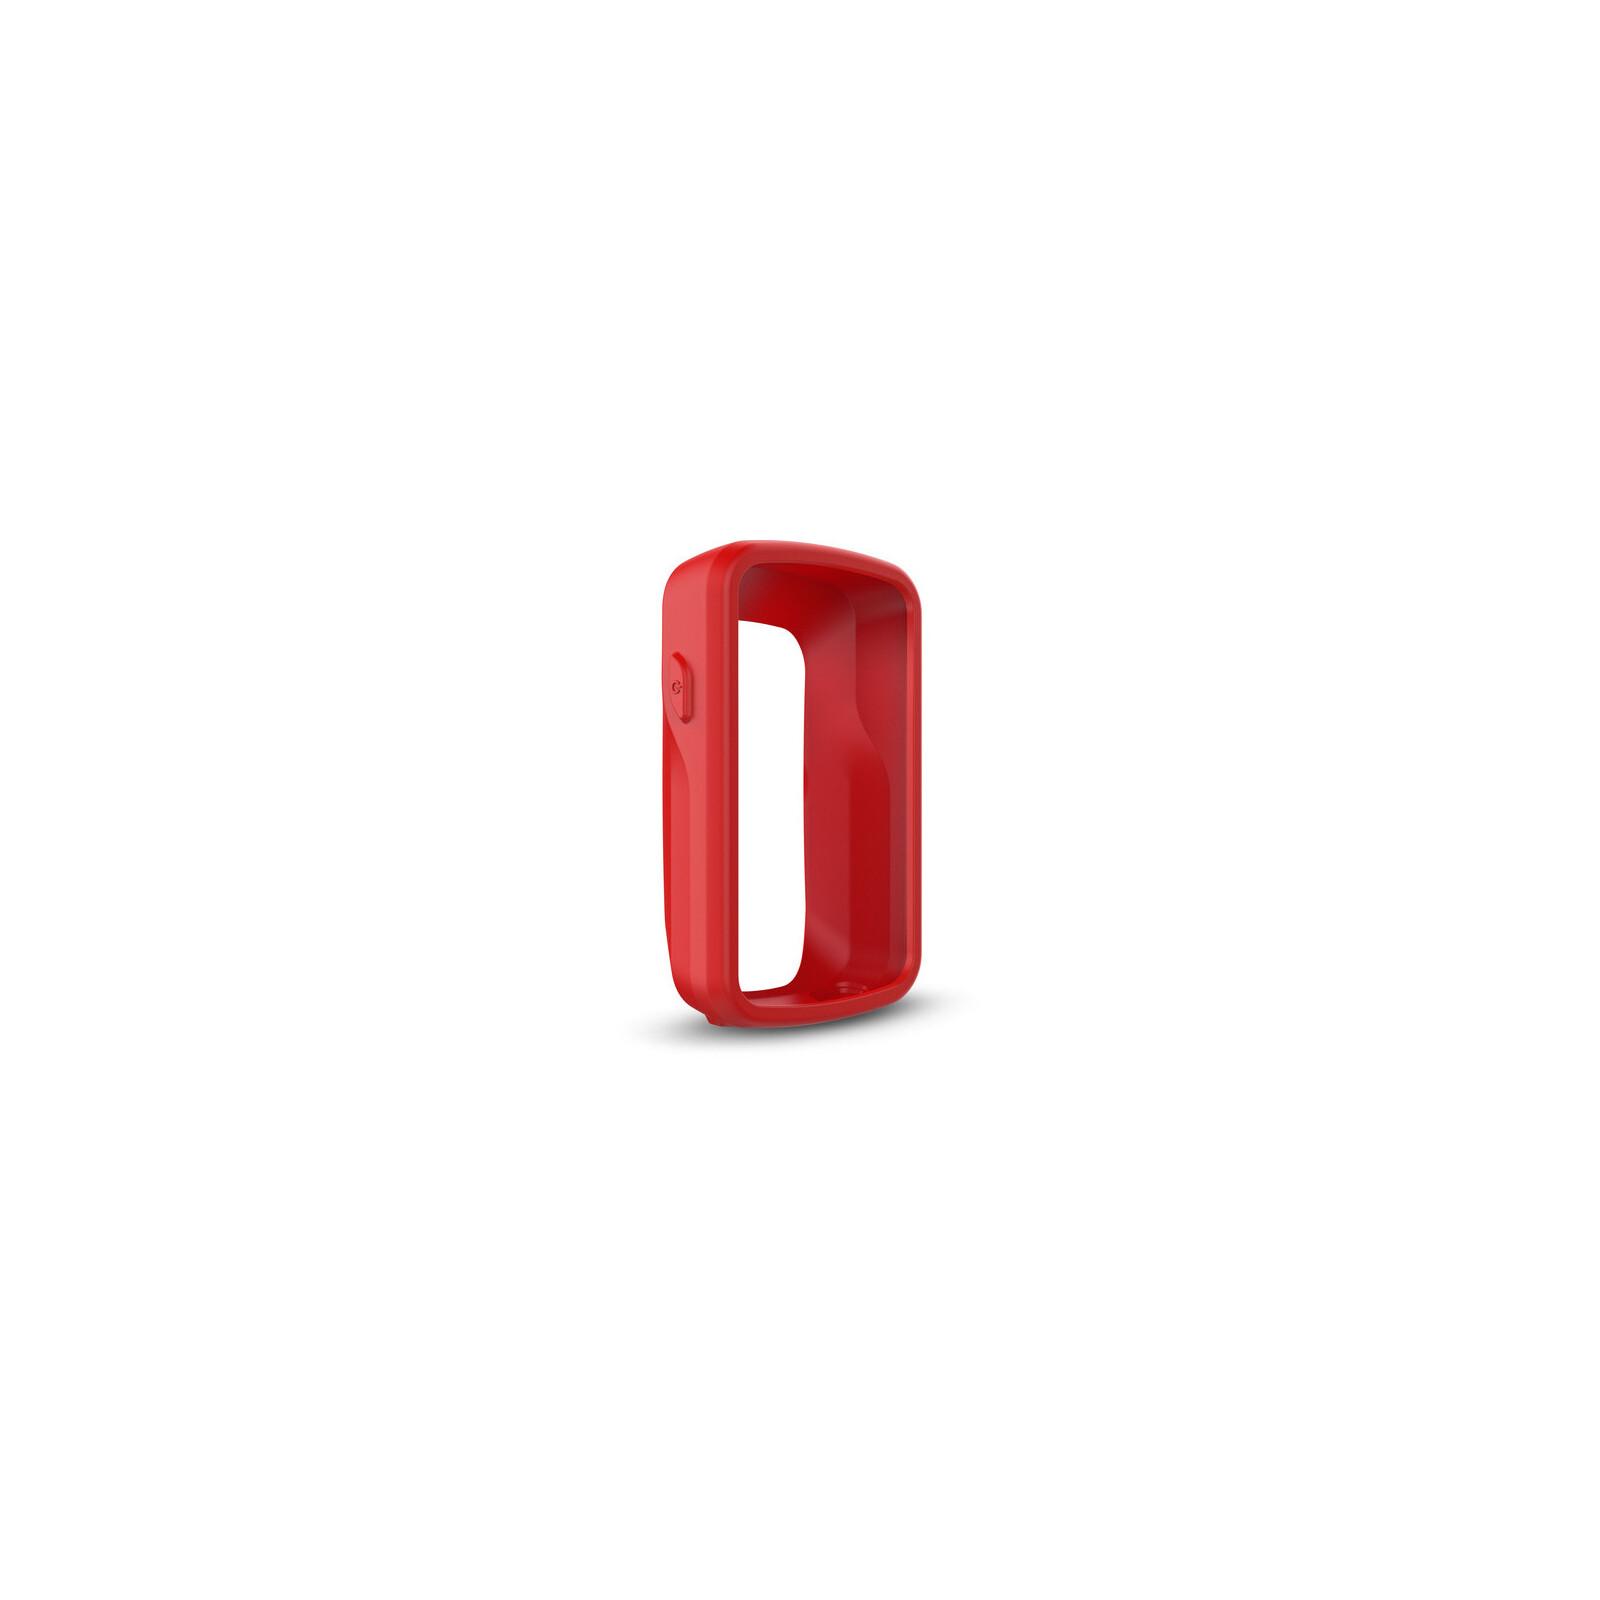 Garmin Edge 820 Schutzhülle Silikon red